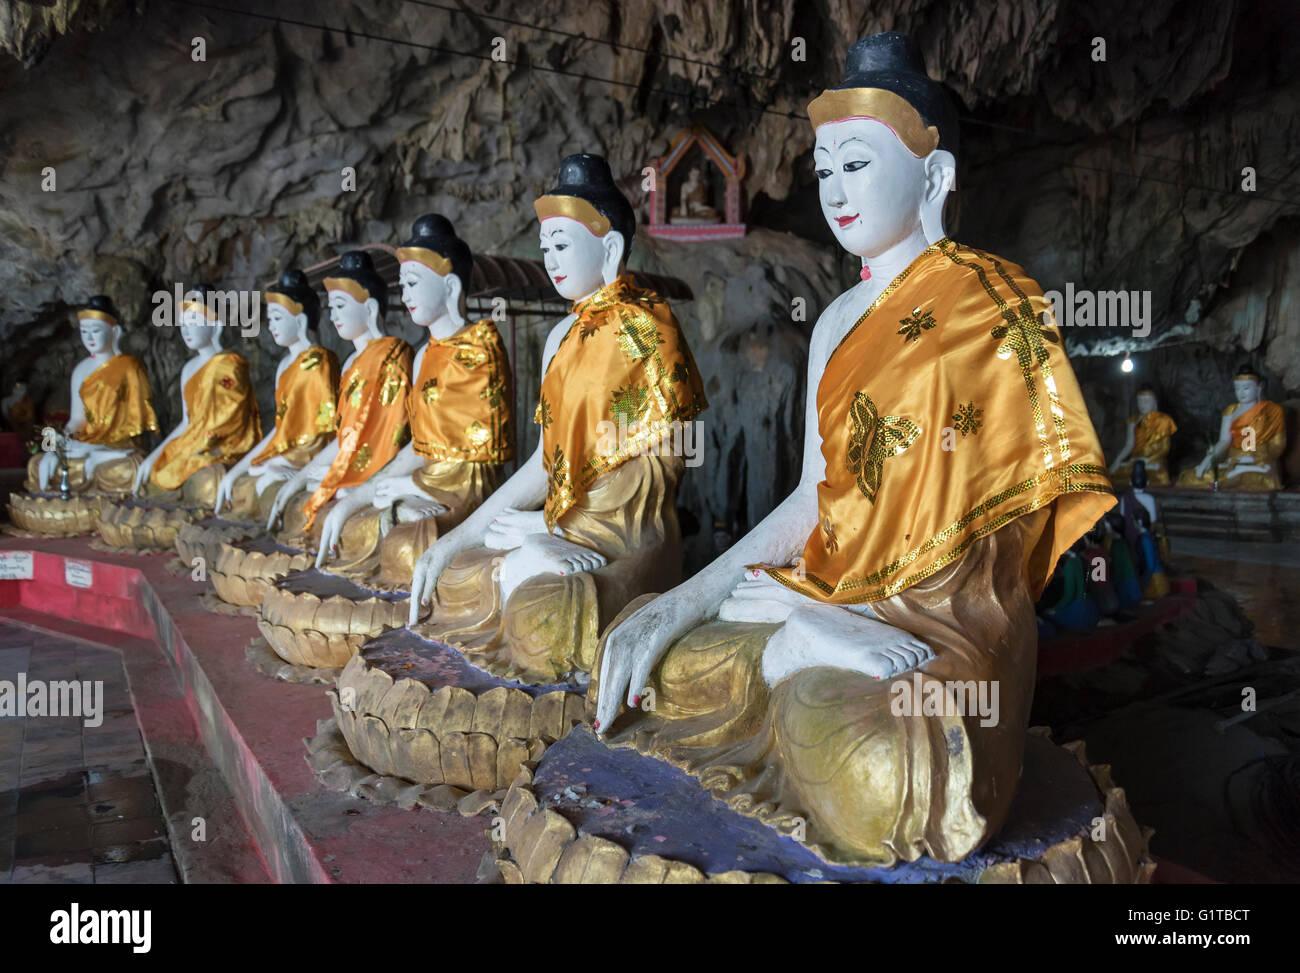 Buddha statues, Bayint Nyi (Bayin Gyi Gu or Begyinni) cave temple and hot springs, Mon State, Burma (Myanmar) Stock Photo